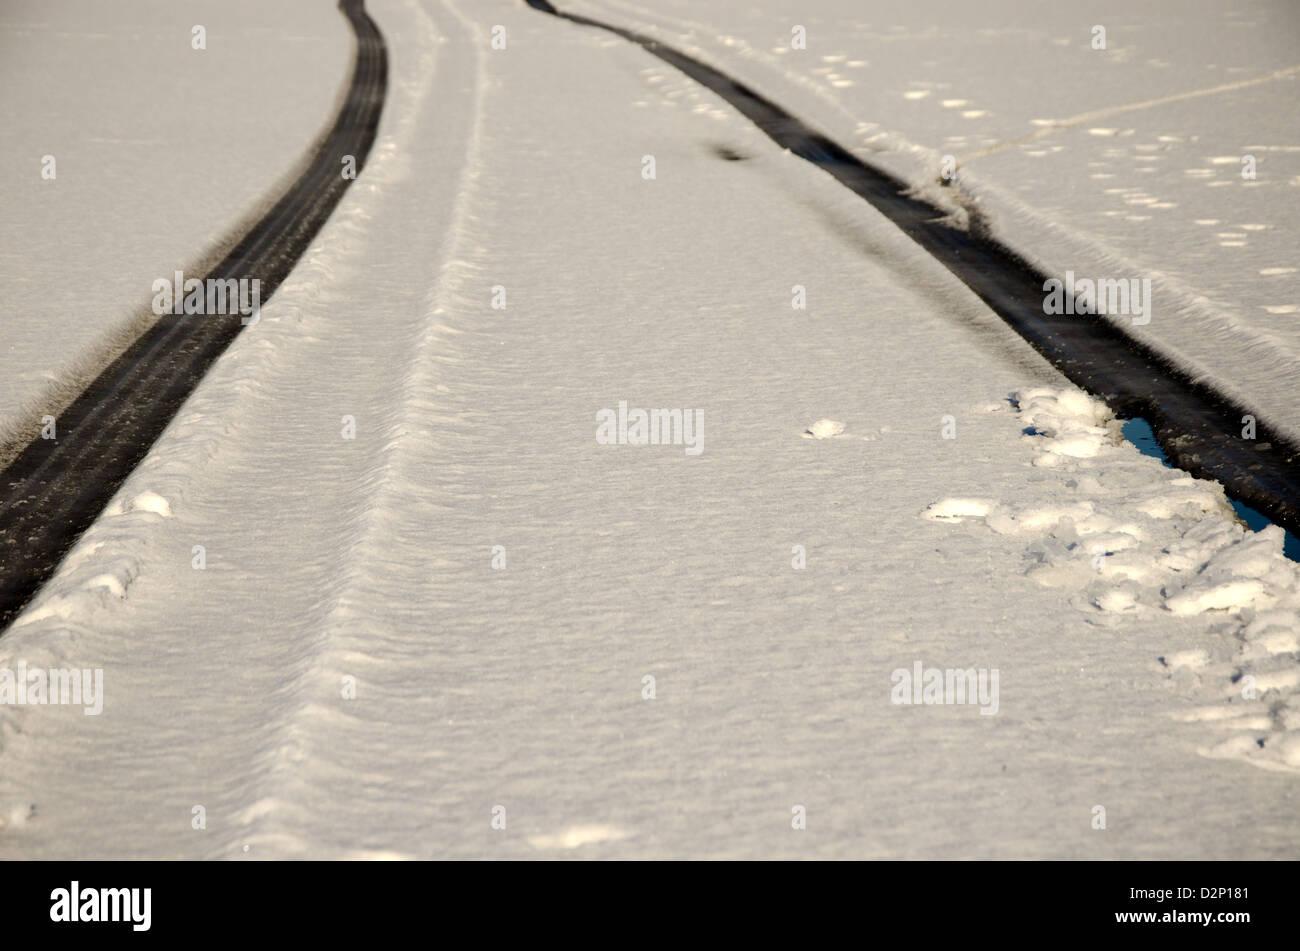 Tyre tracks in snow - Stock Image